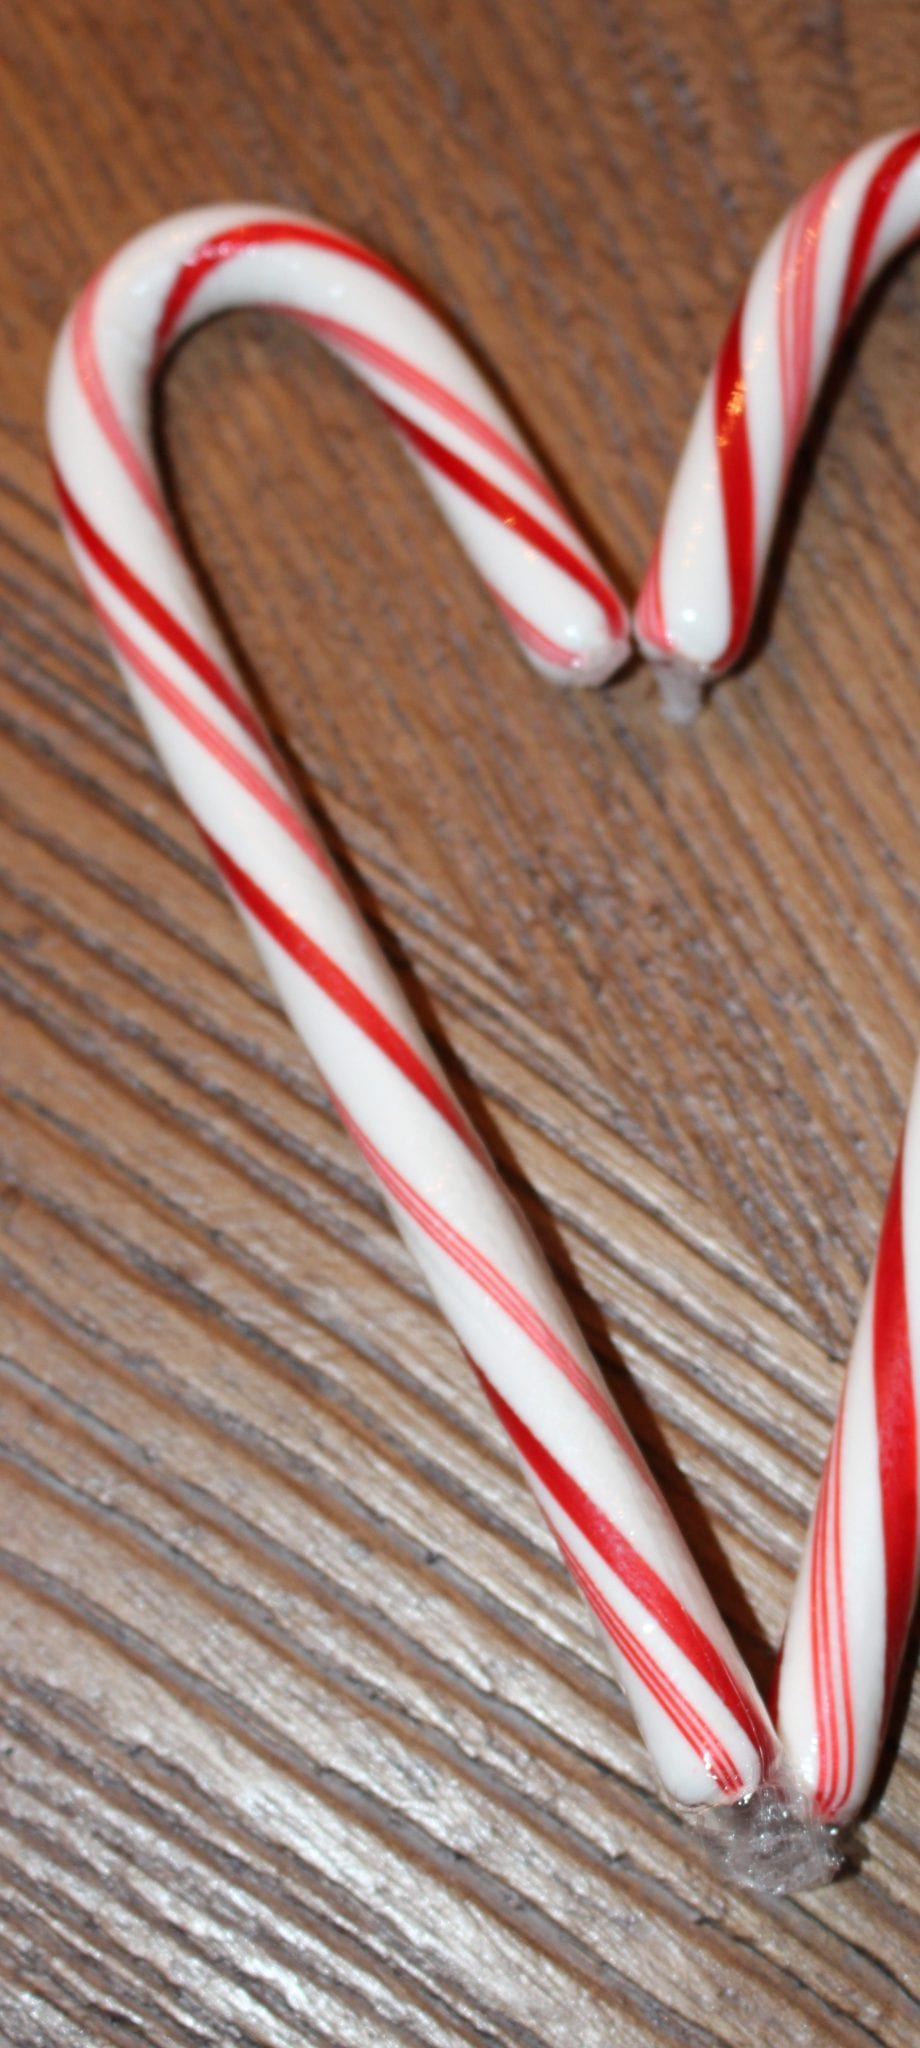 Candy Cane Game. Christmas Fun www.goodlifeofahousewife.com